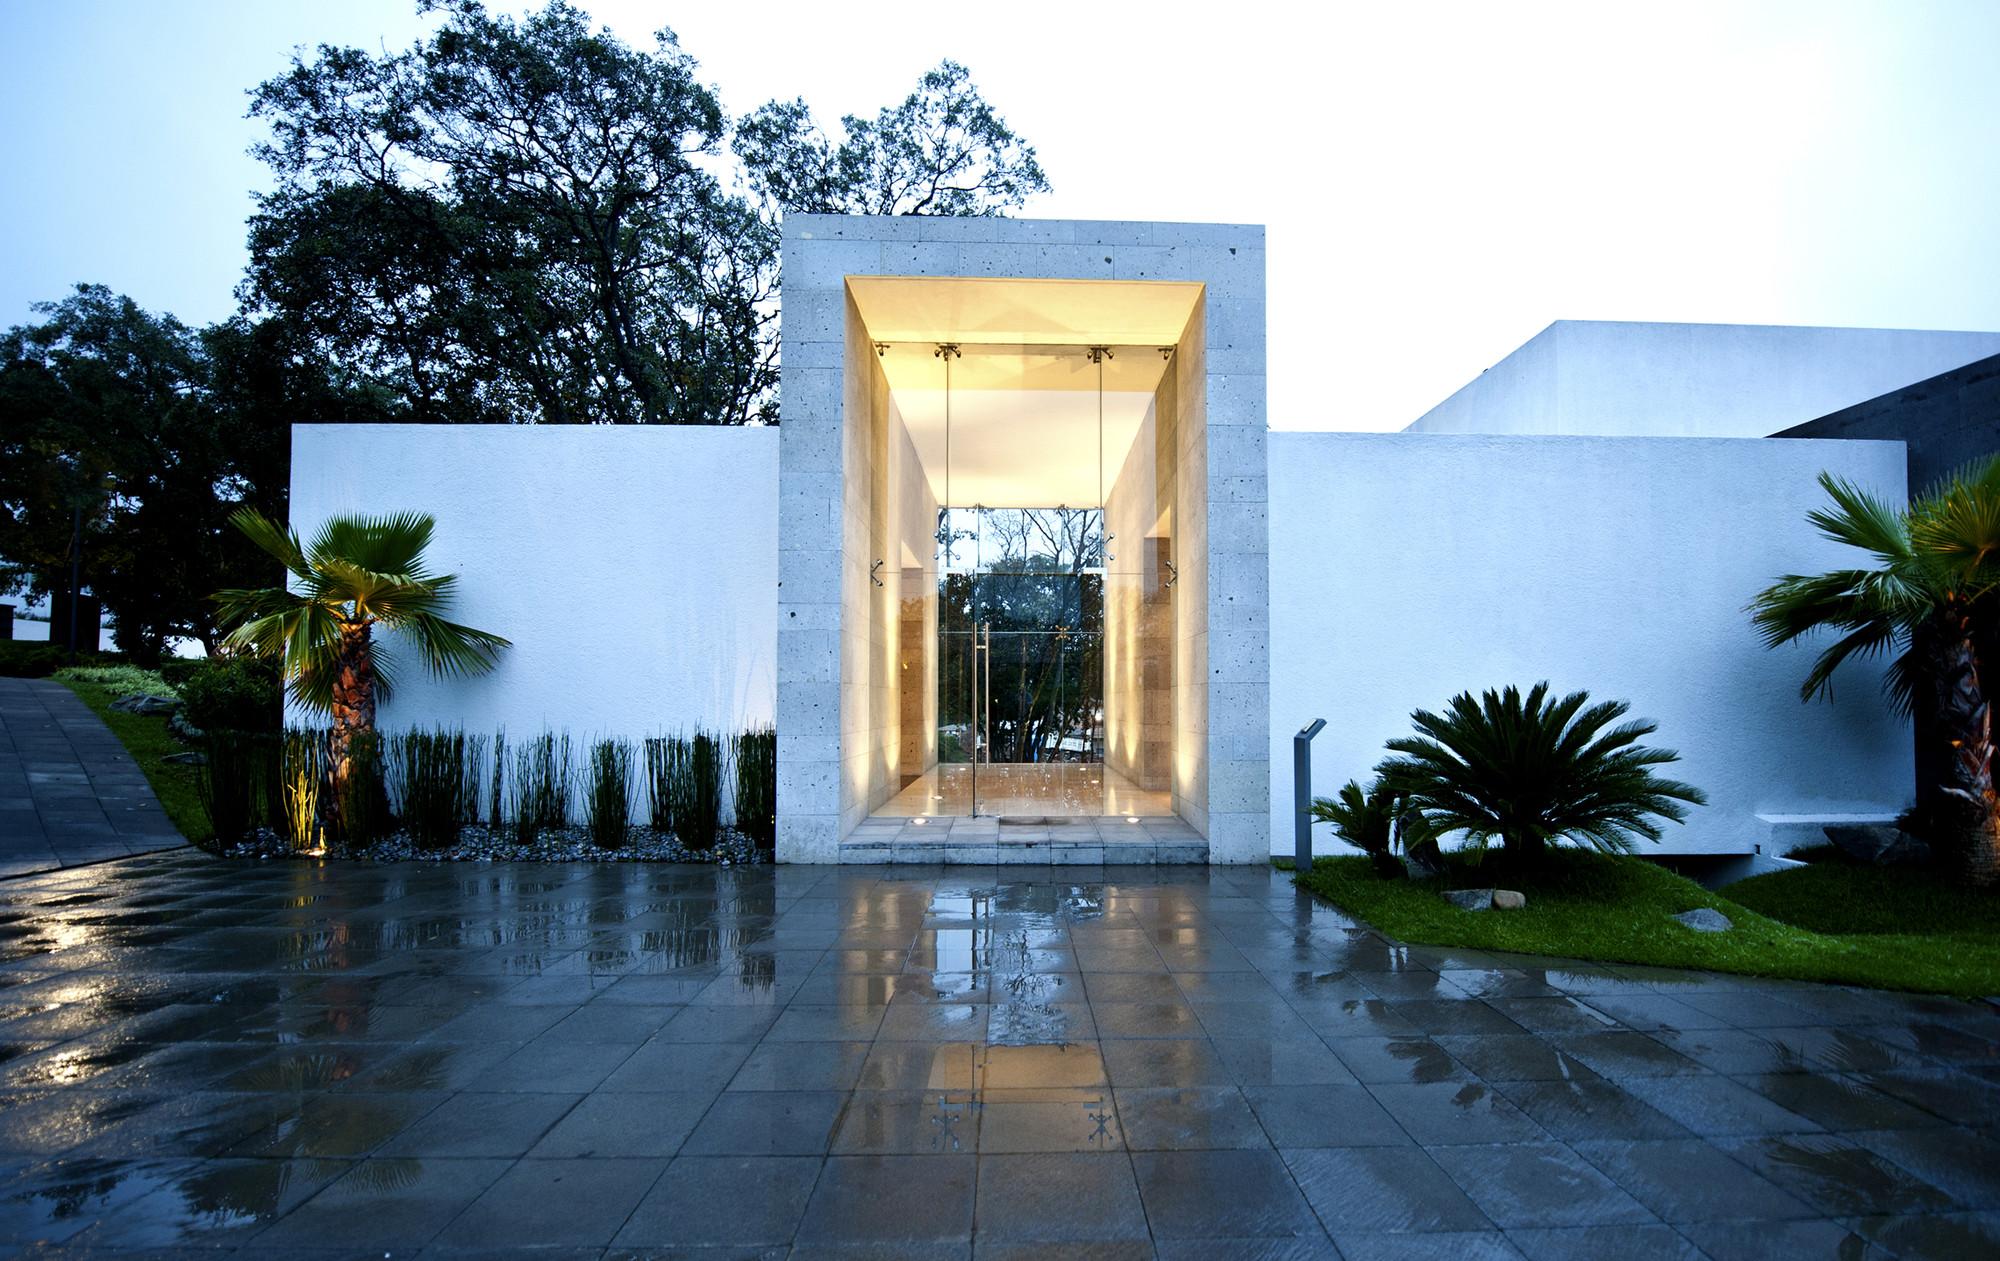 Cañada House / GrupoMM, © Iván Casillas